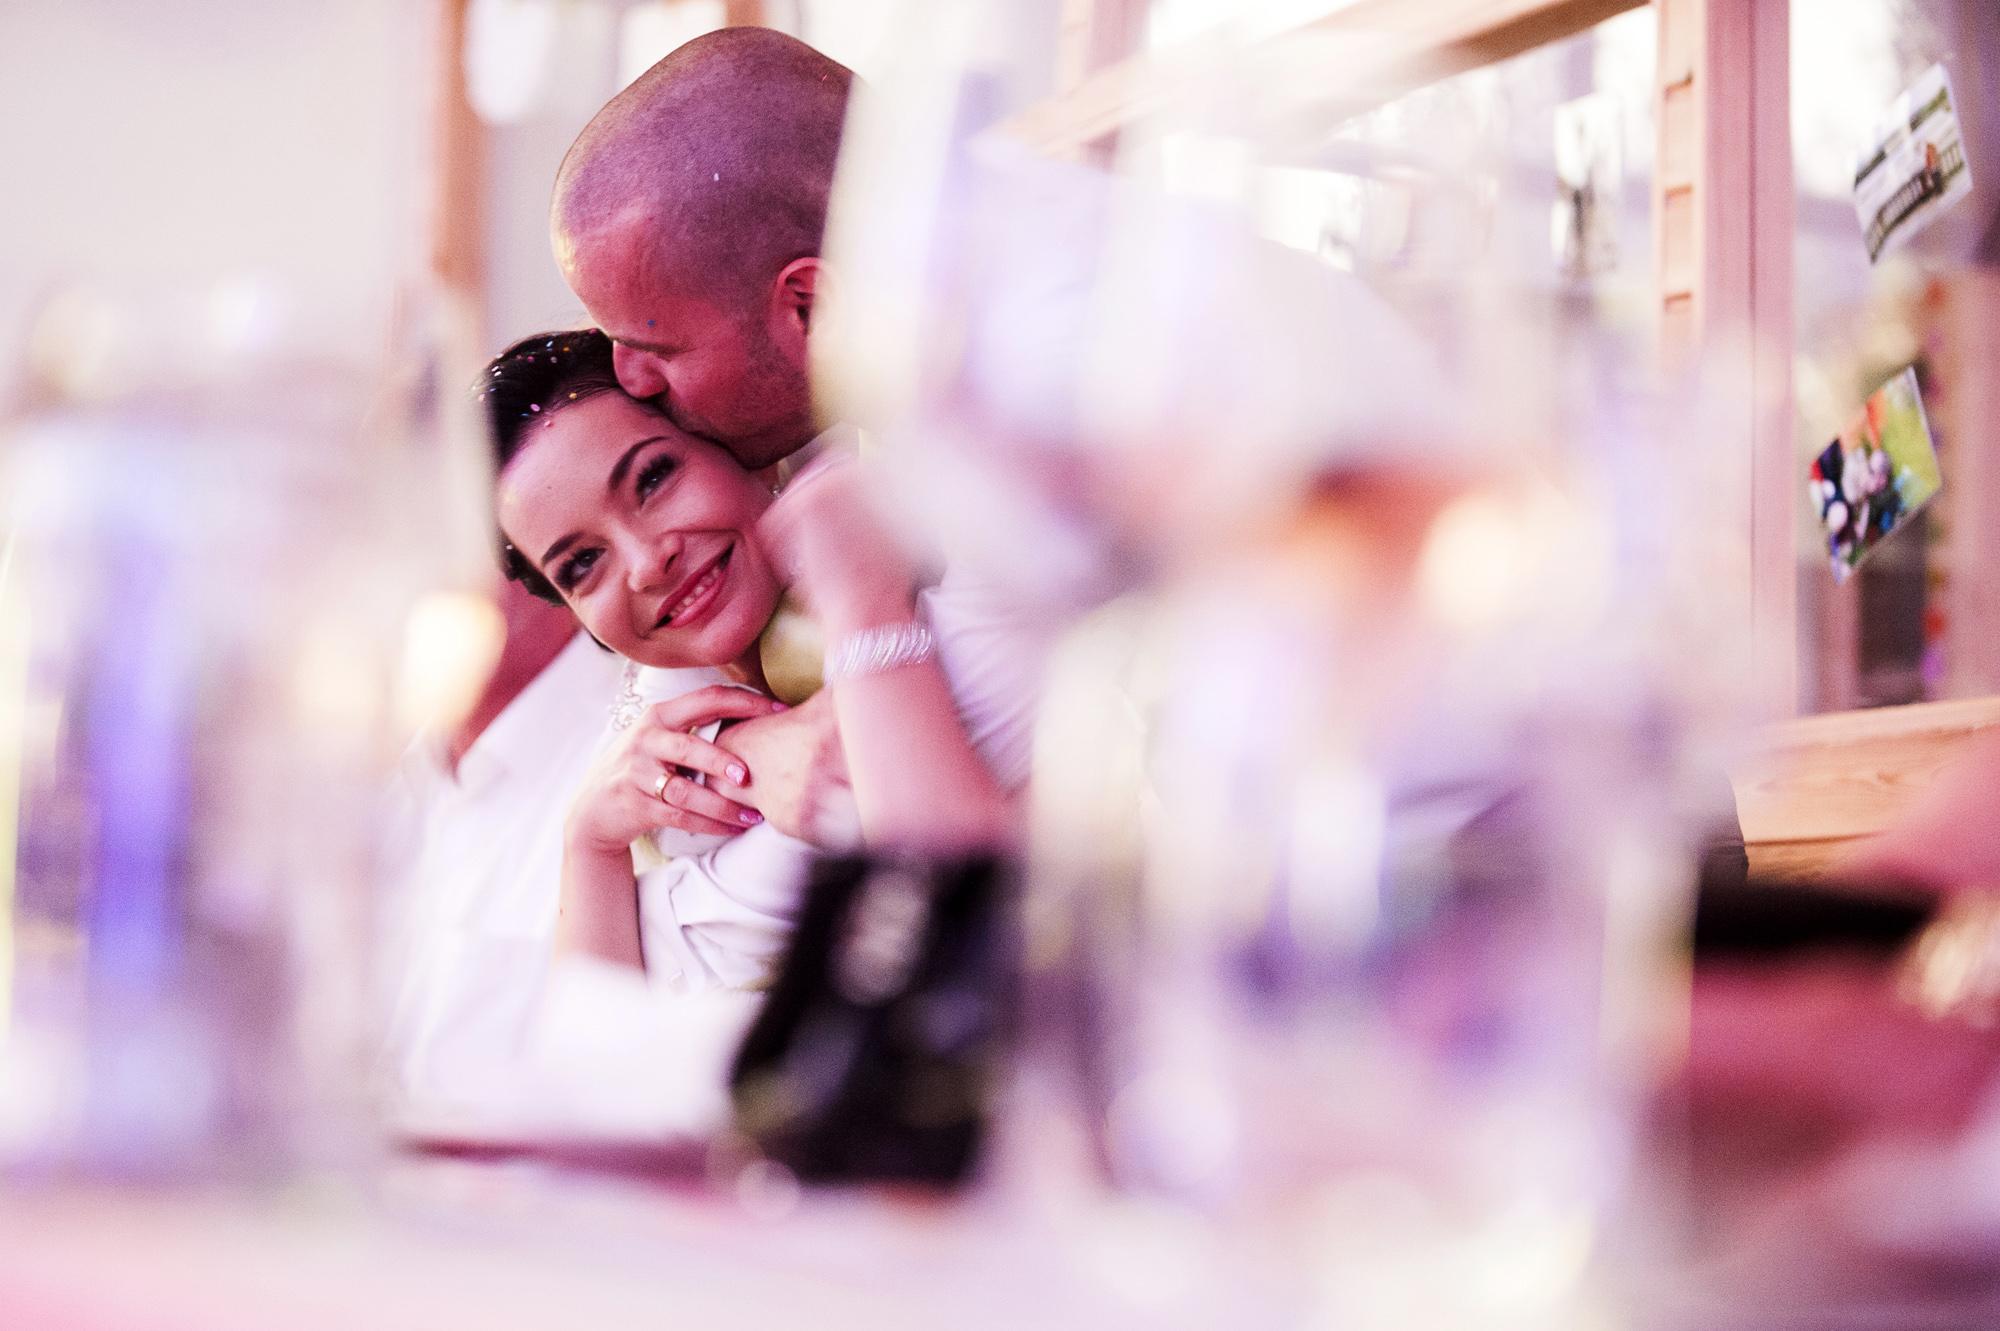 Wedding photographer in Amsterdam